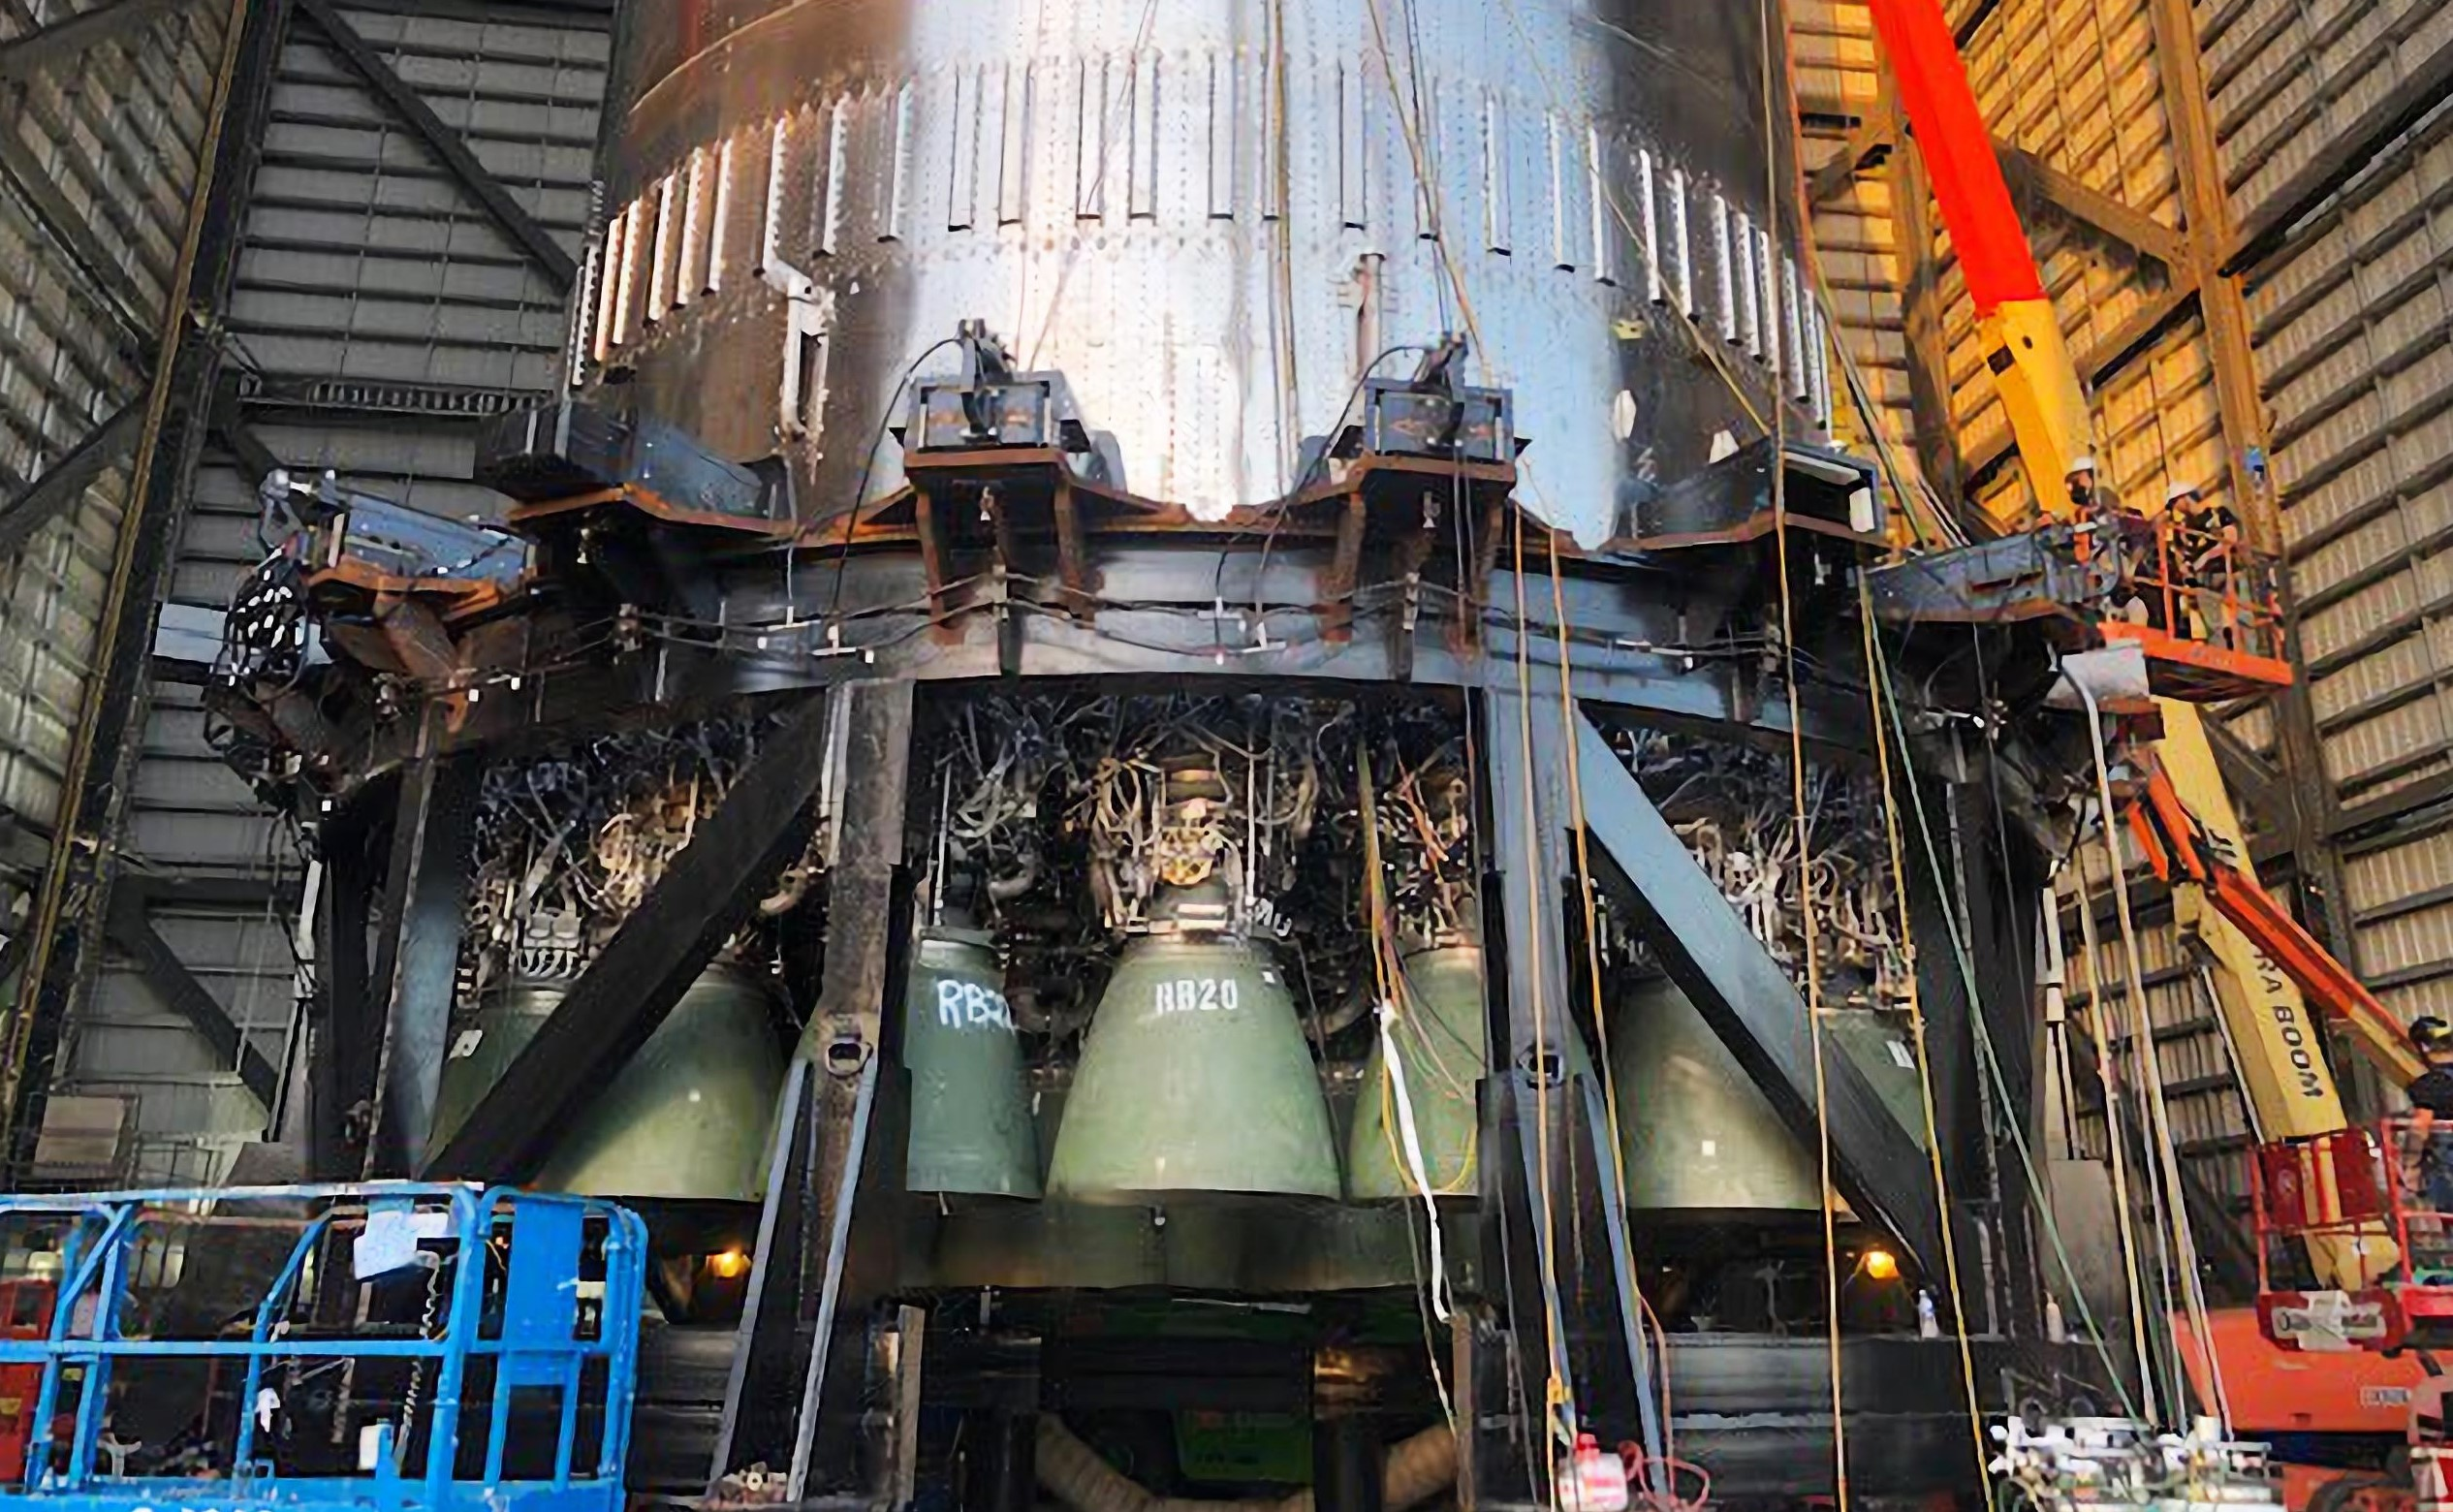 Super Heavy Booster 4 080221 (SpaceX) Elon Musk 29 engines 4X 1 crop